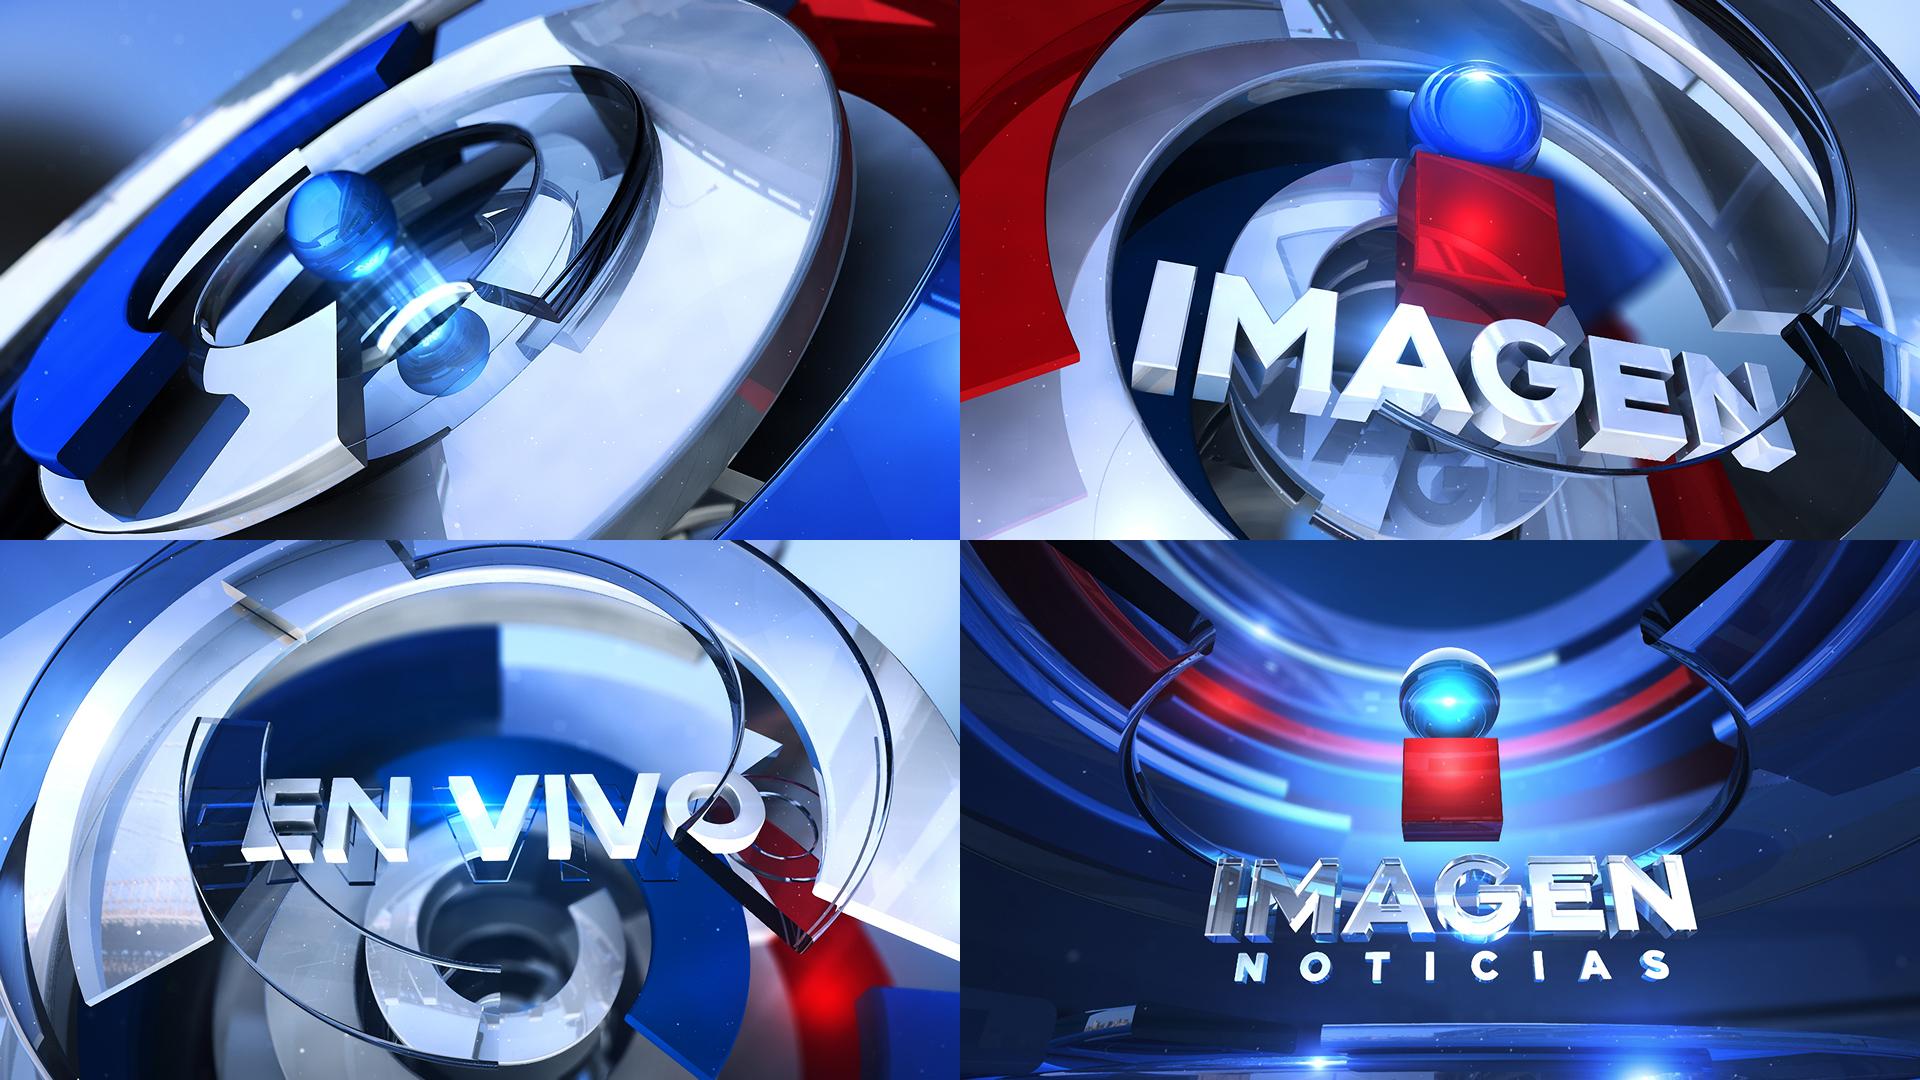 broadcast_design_grupo_imagen_mexico_news_titles_renderon_04.jpg